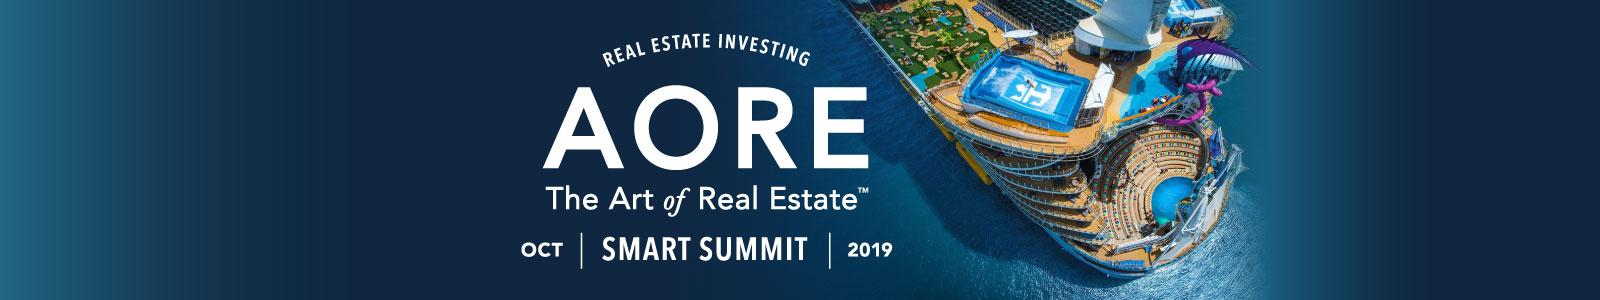 AORE Smart Summit 2019